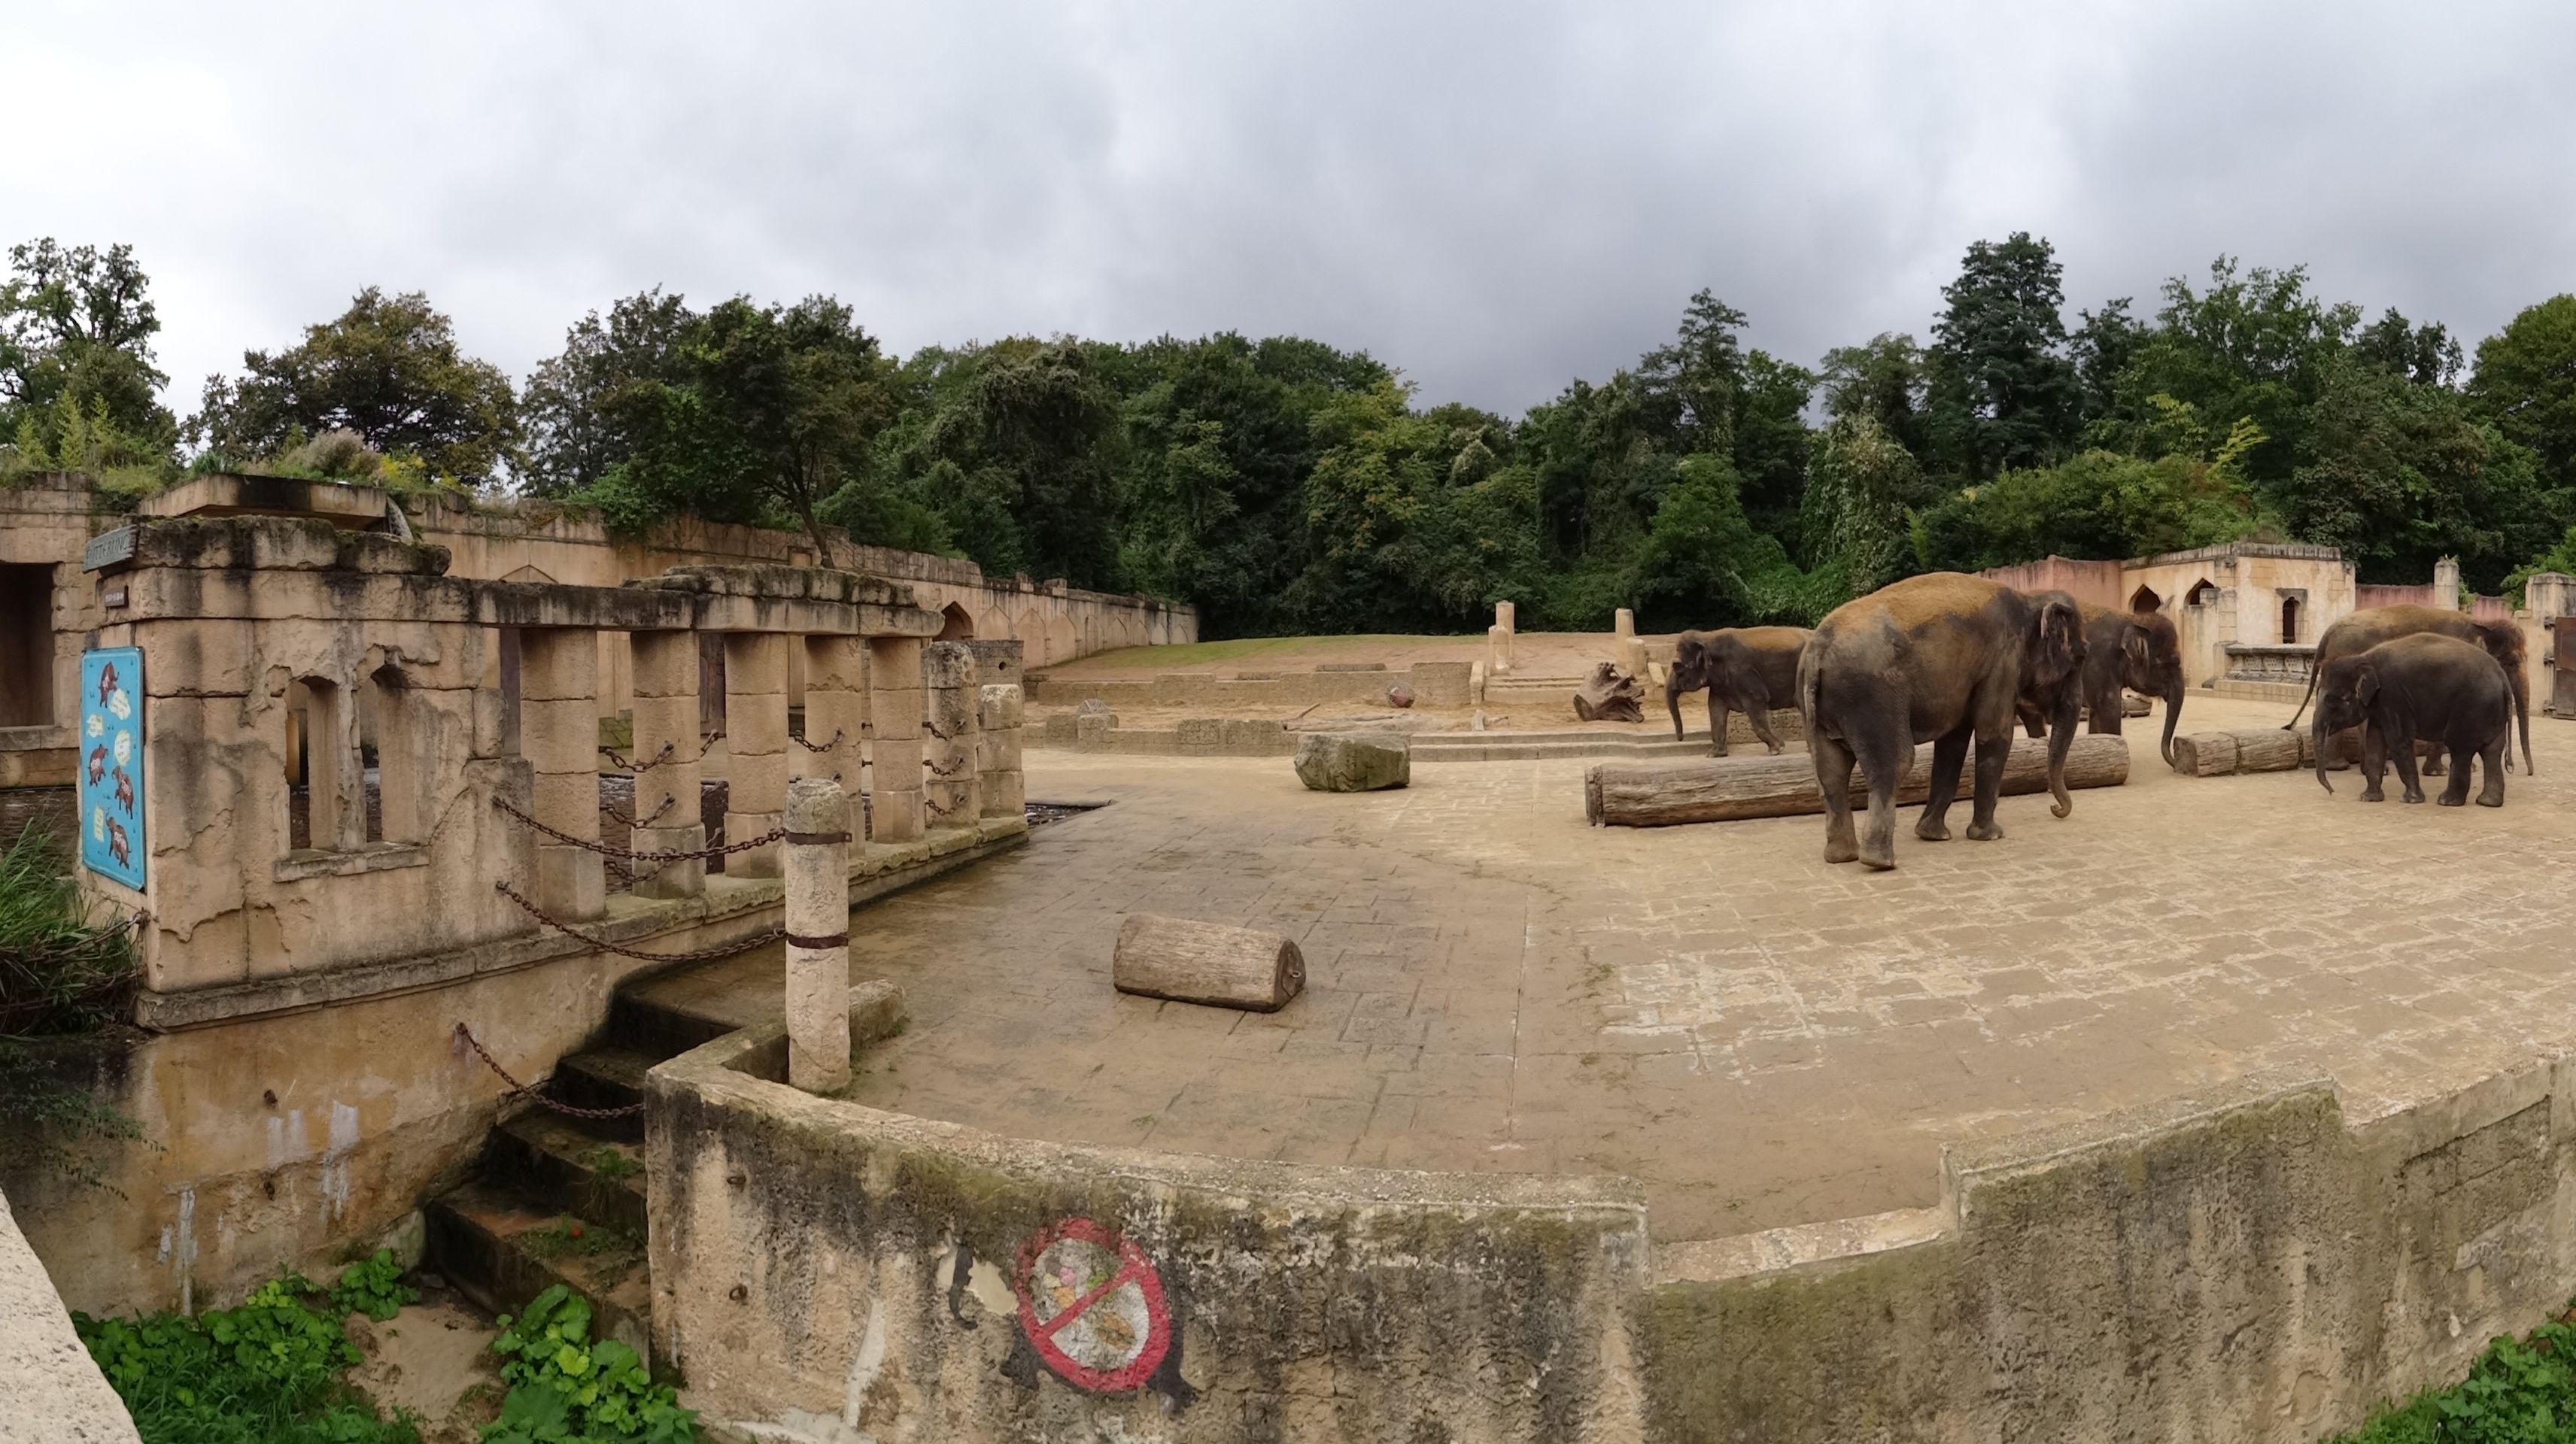 Elefantenanlage